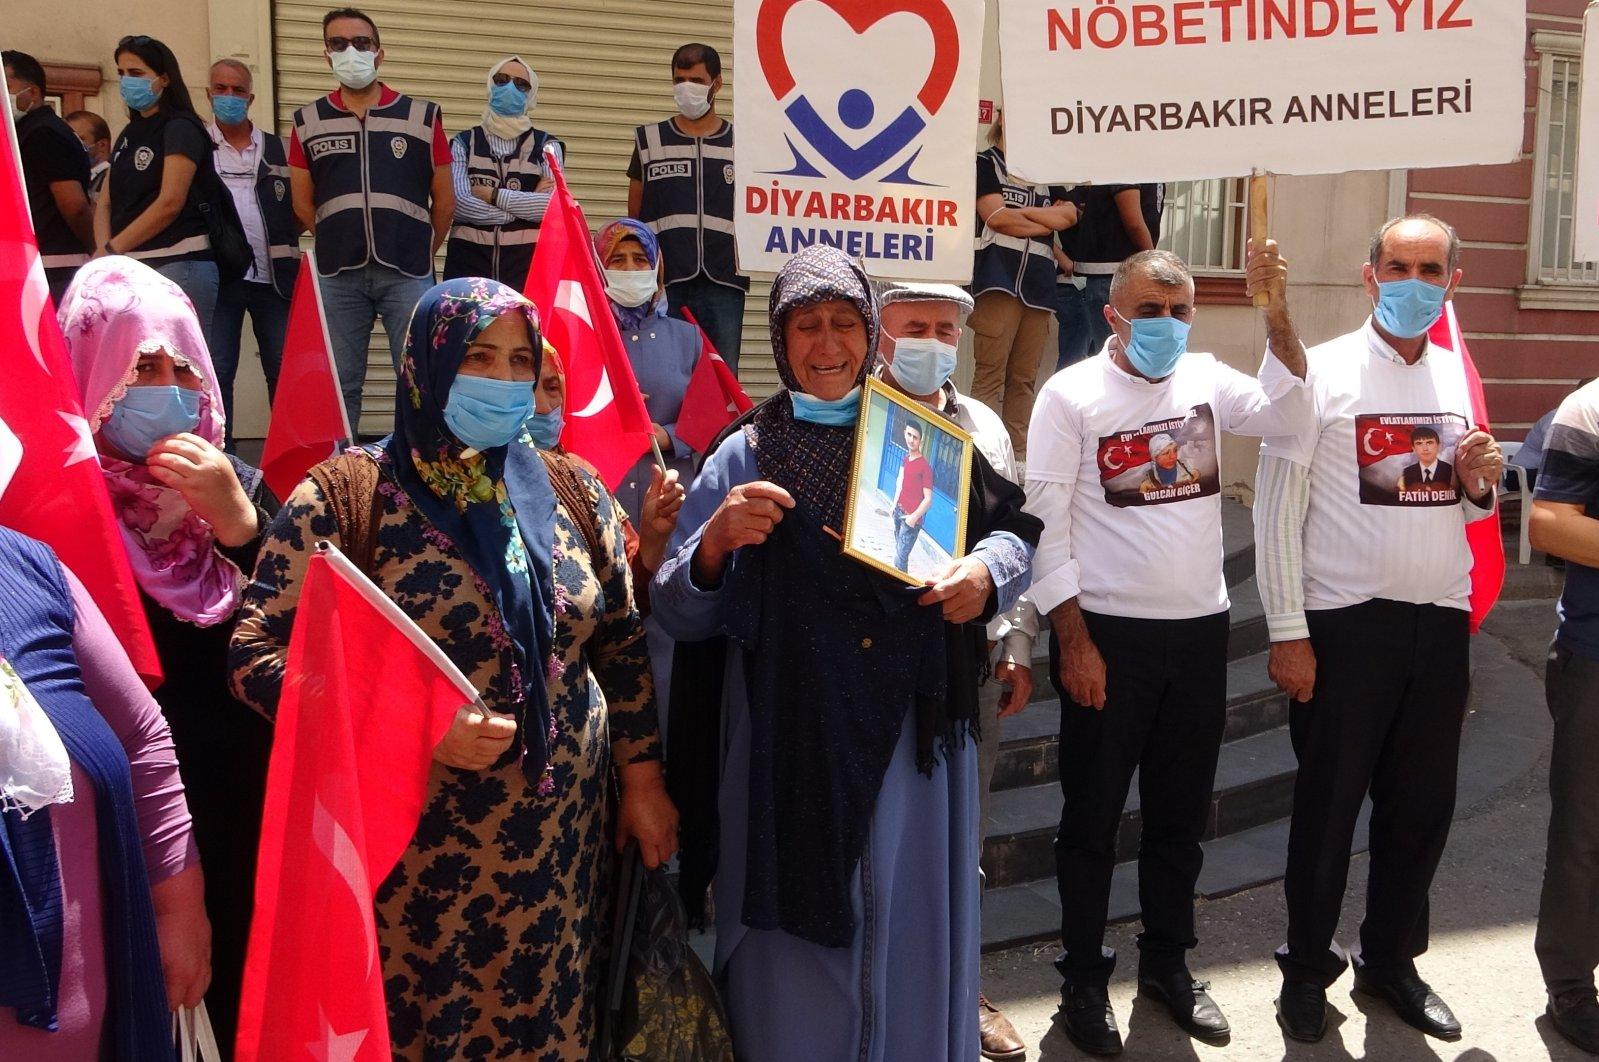 Families protest the PKK terrorist group in Turkey's southeastern Diyarbakır province, June 25, 2021. (IHA Photo)